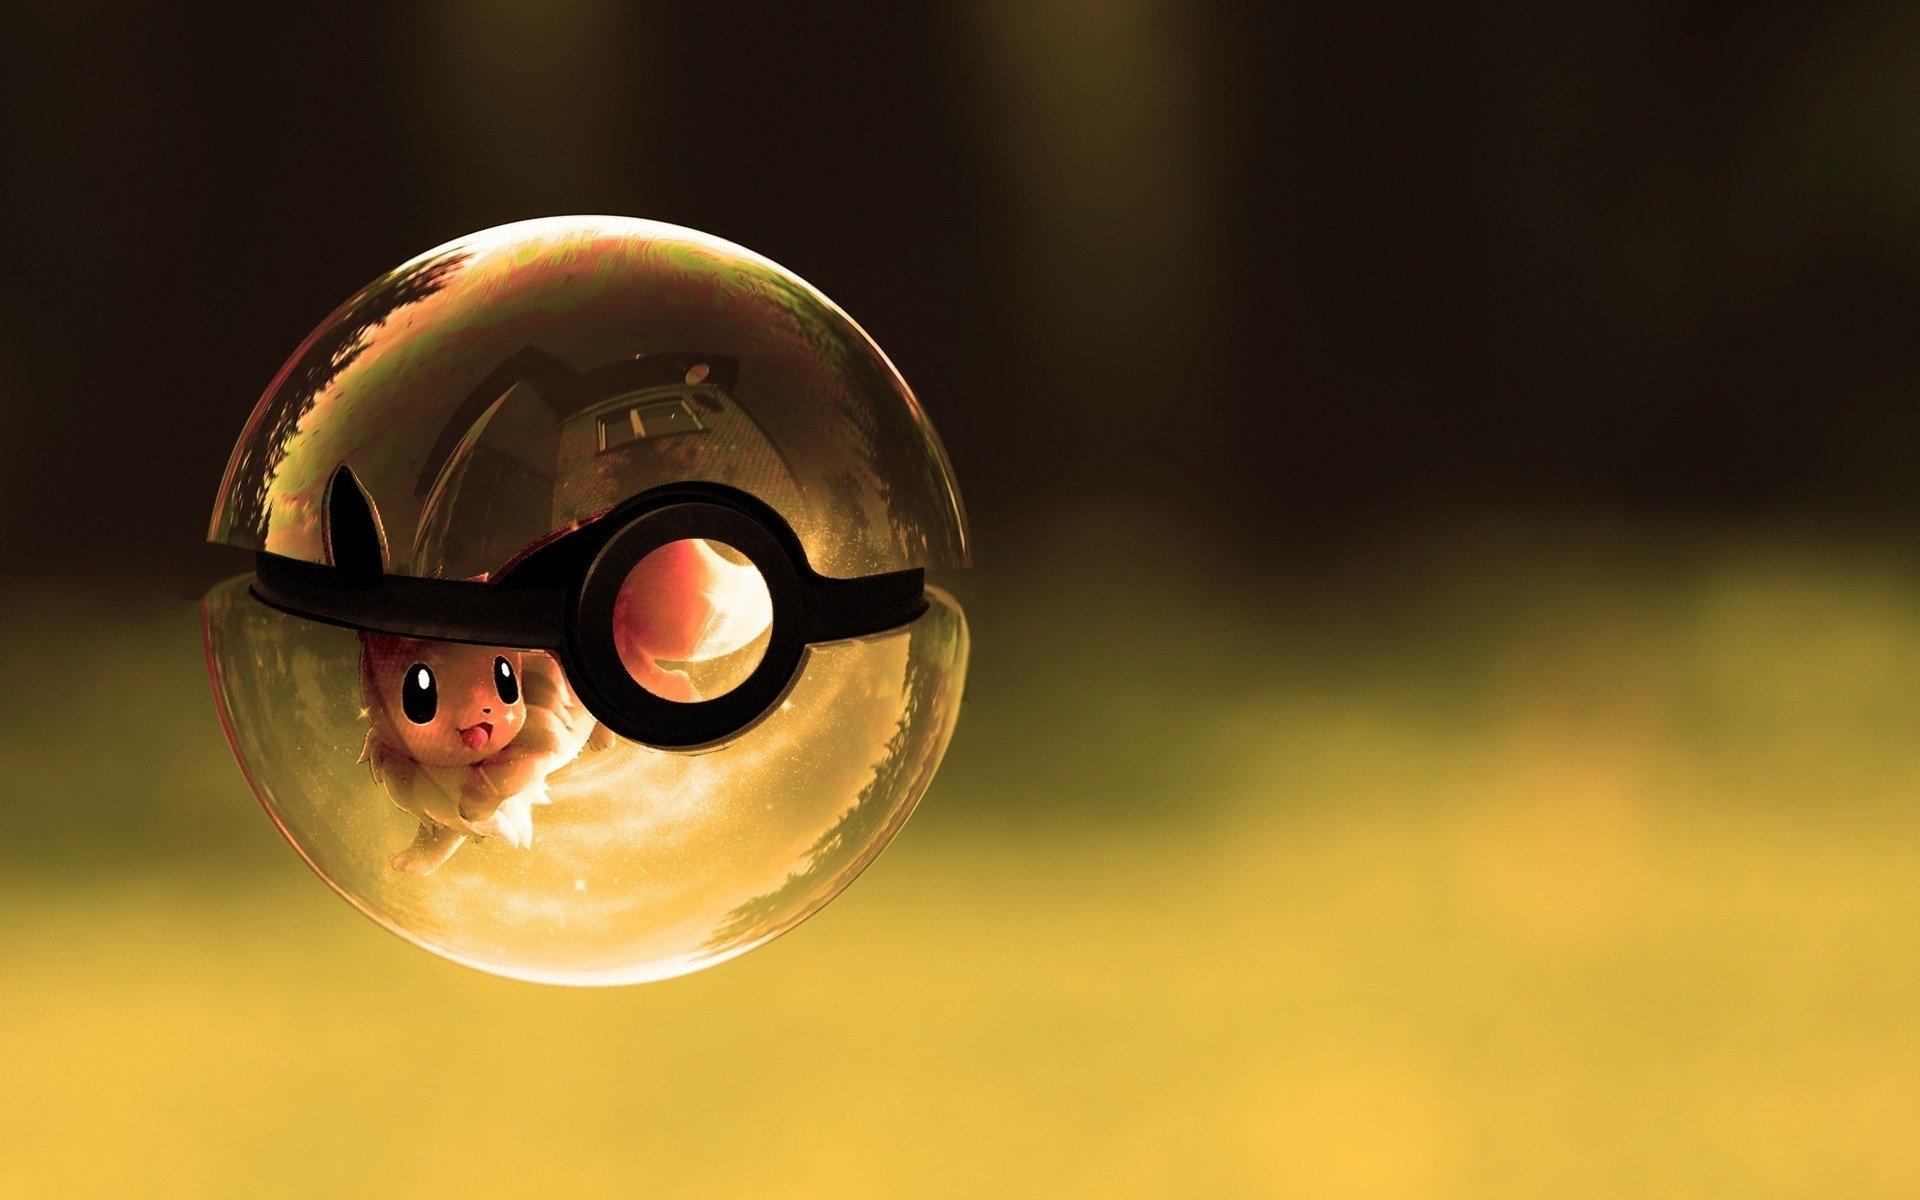 Cool Fall Wallpaper Hd Pokemon Phone Eevee Backgrounds Pixelstalk Net